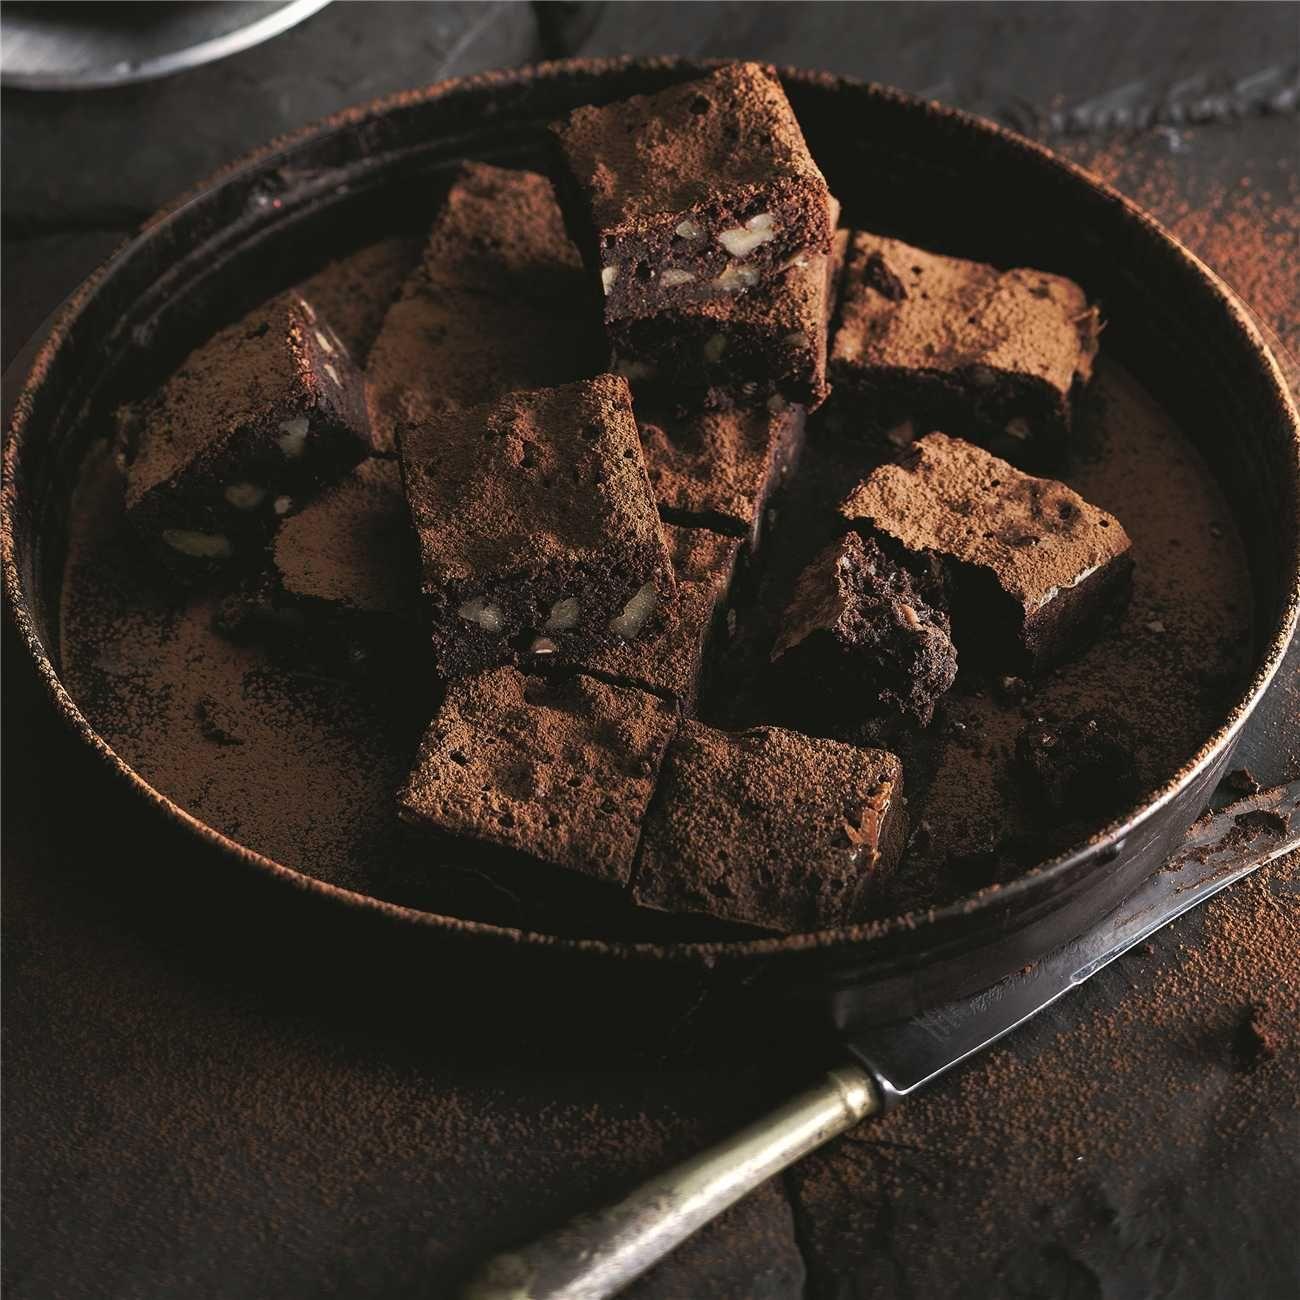 Caramel pecan brownies recipe woolworths desserts